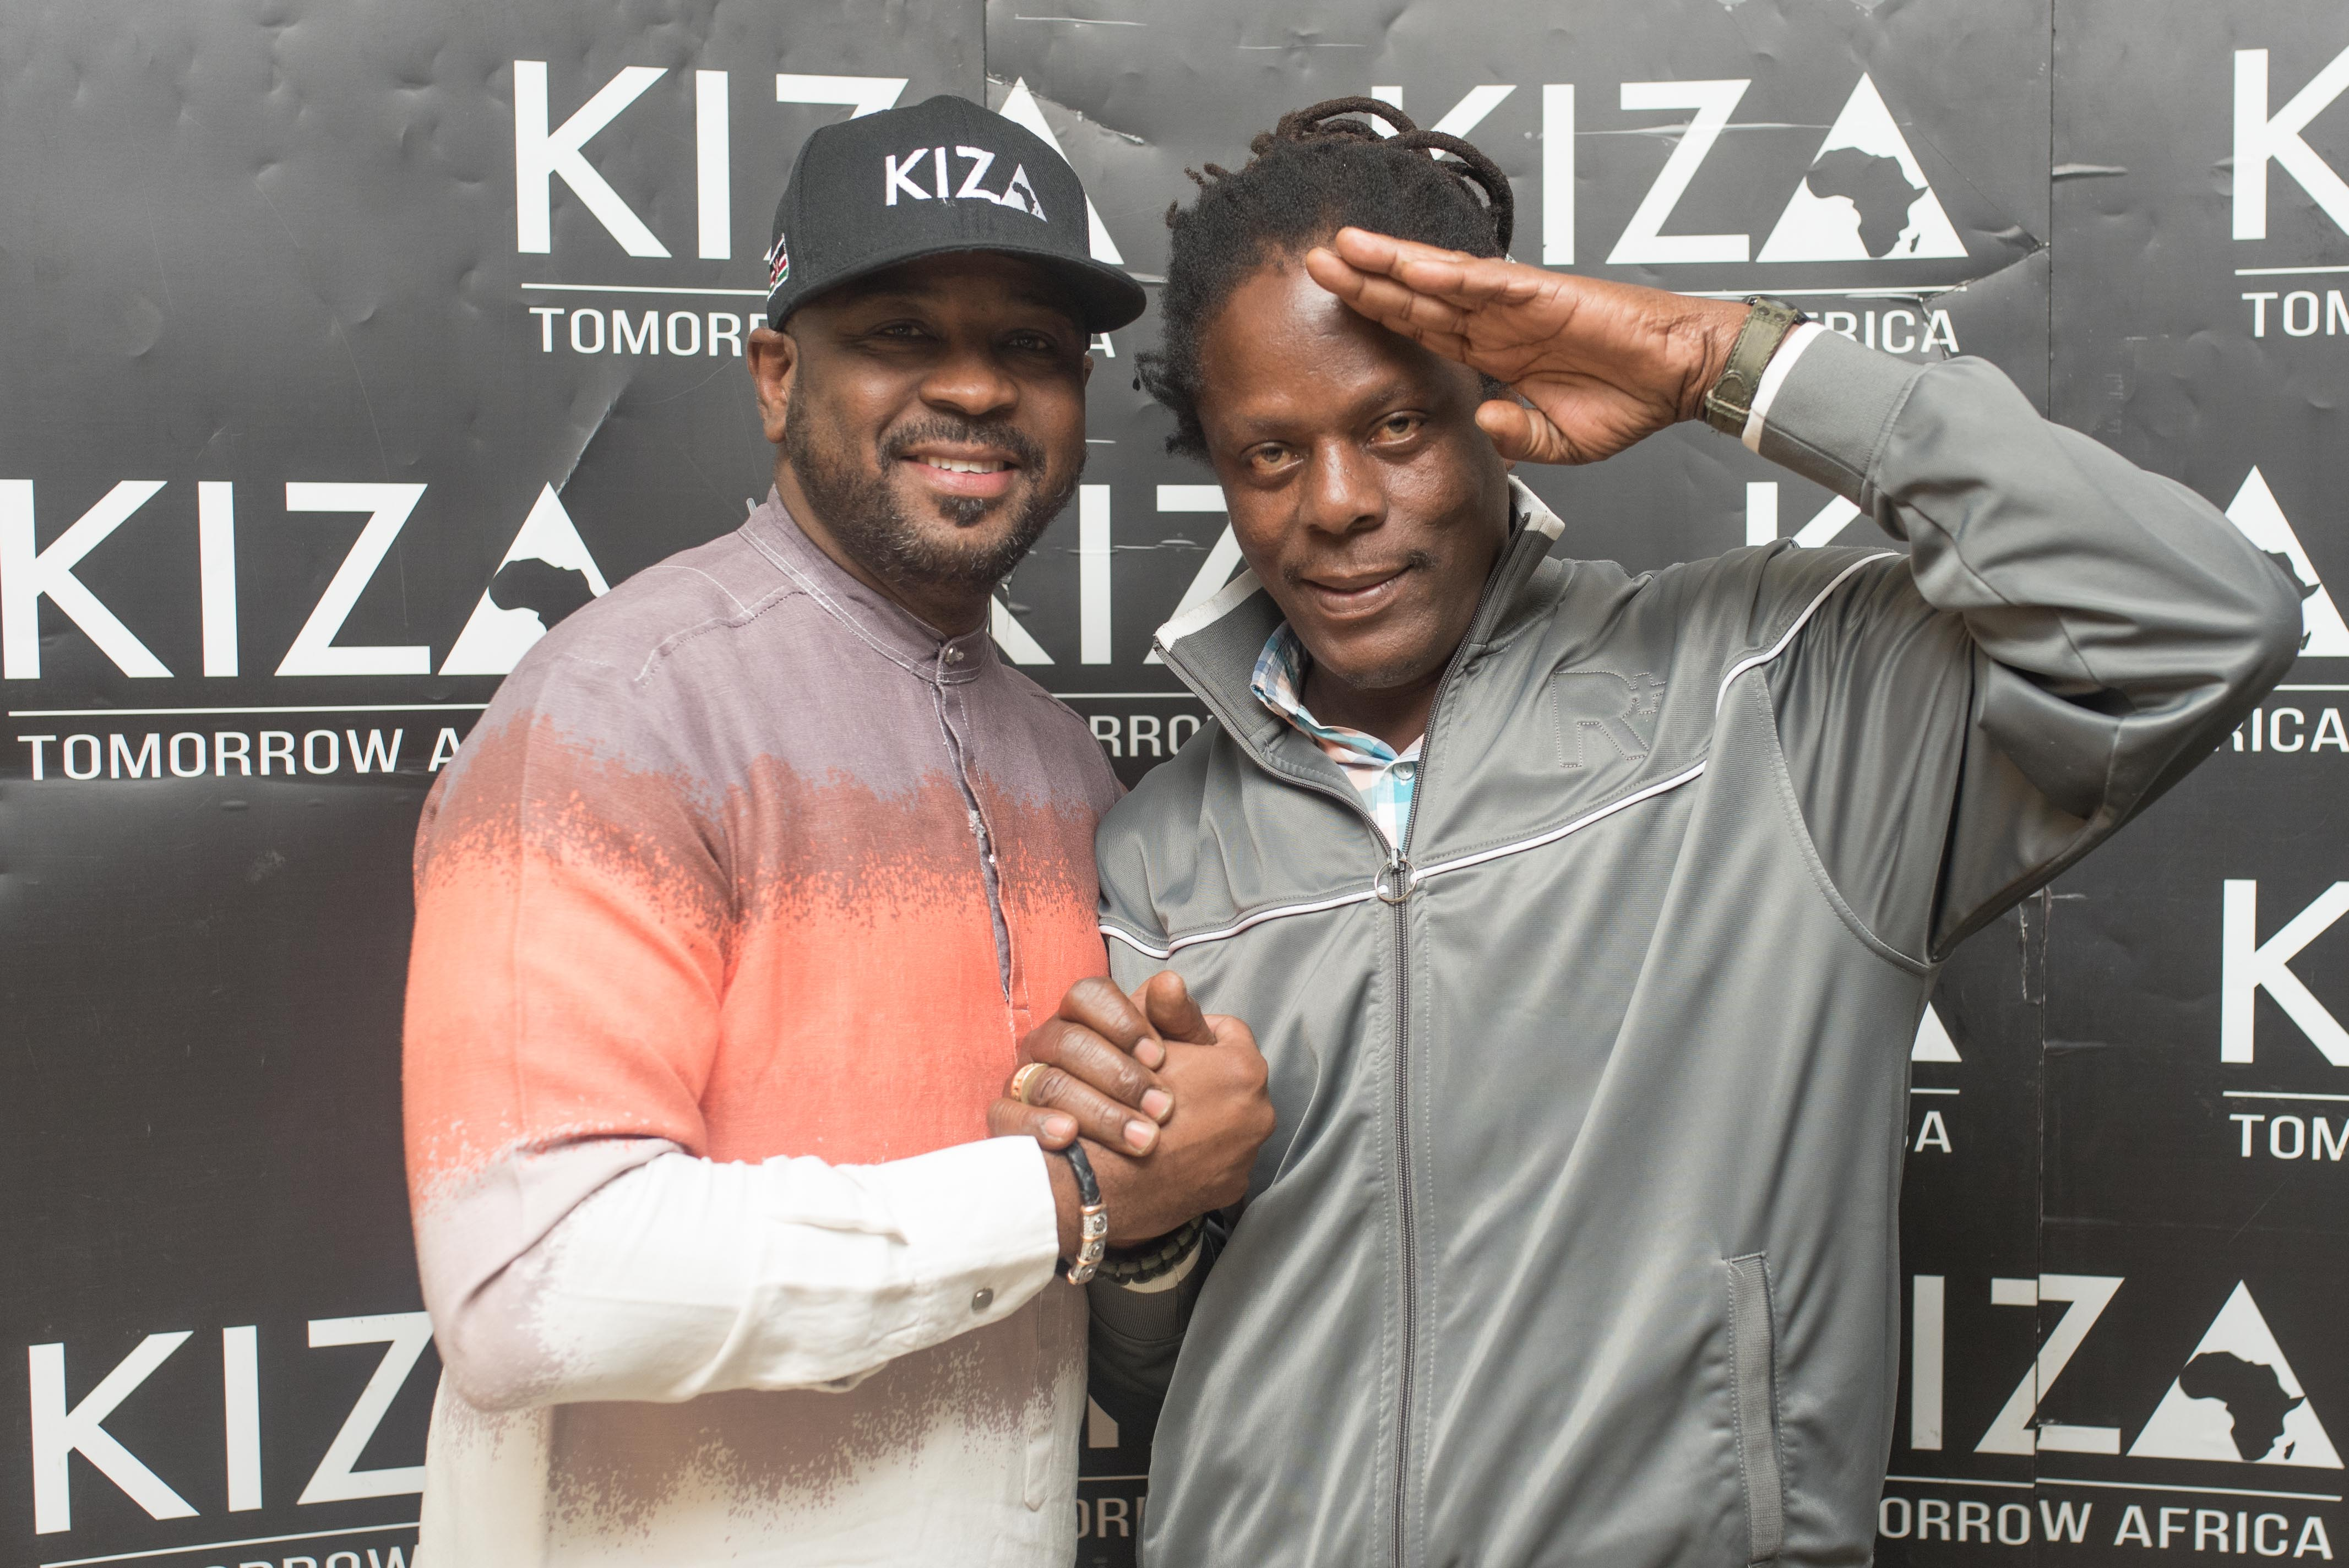 Richie Spice at Kiza